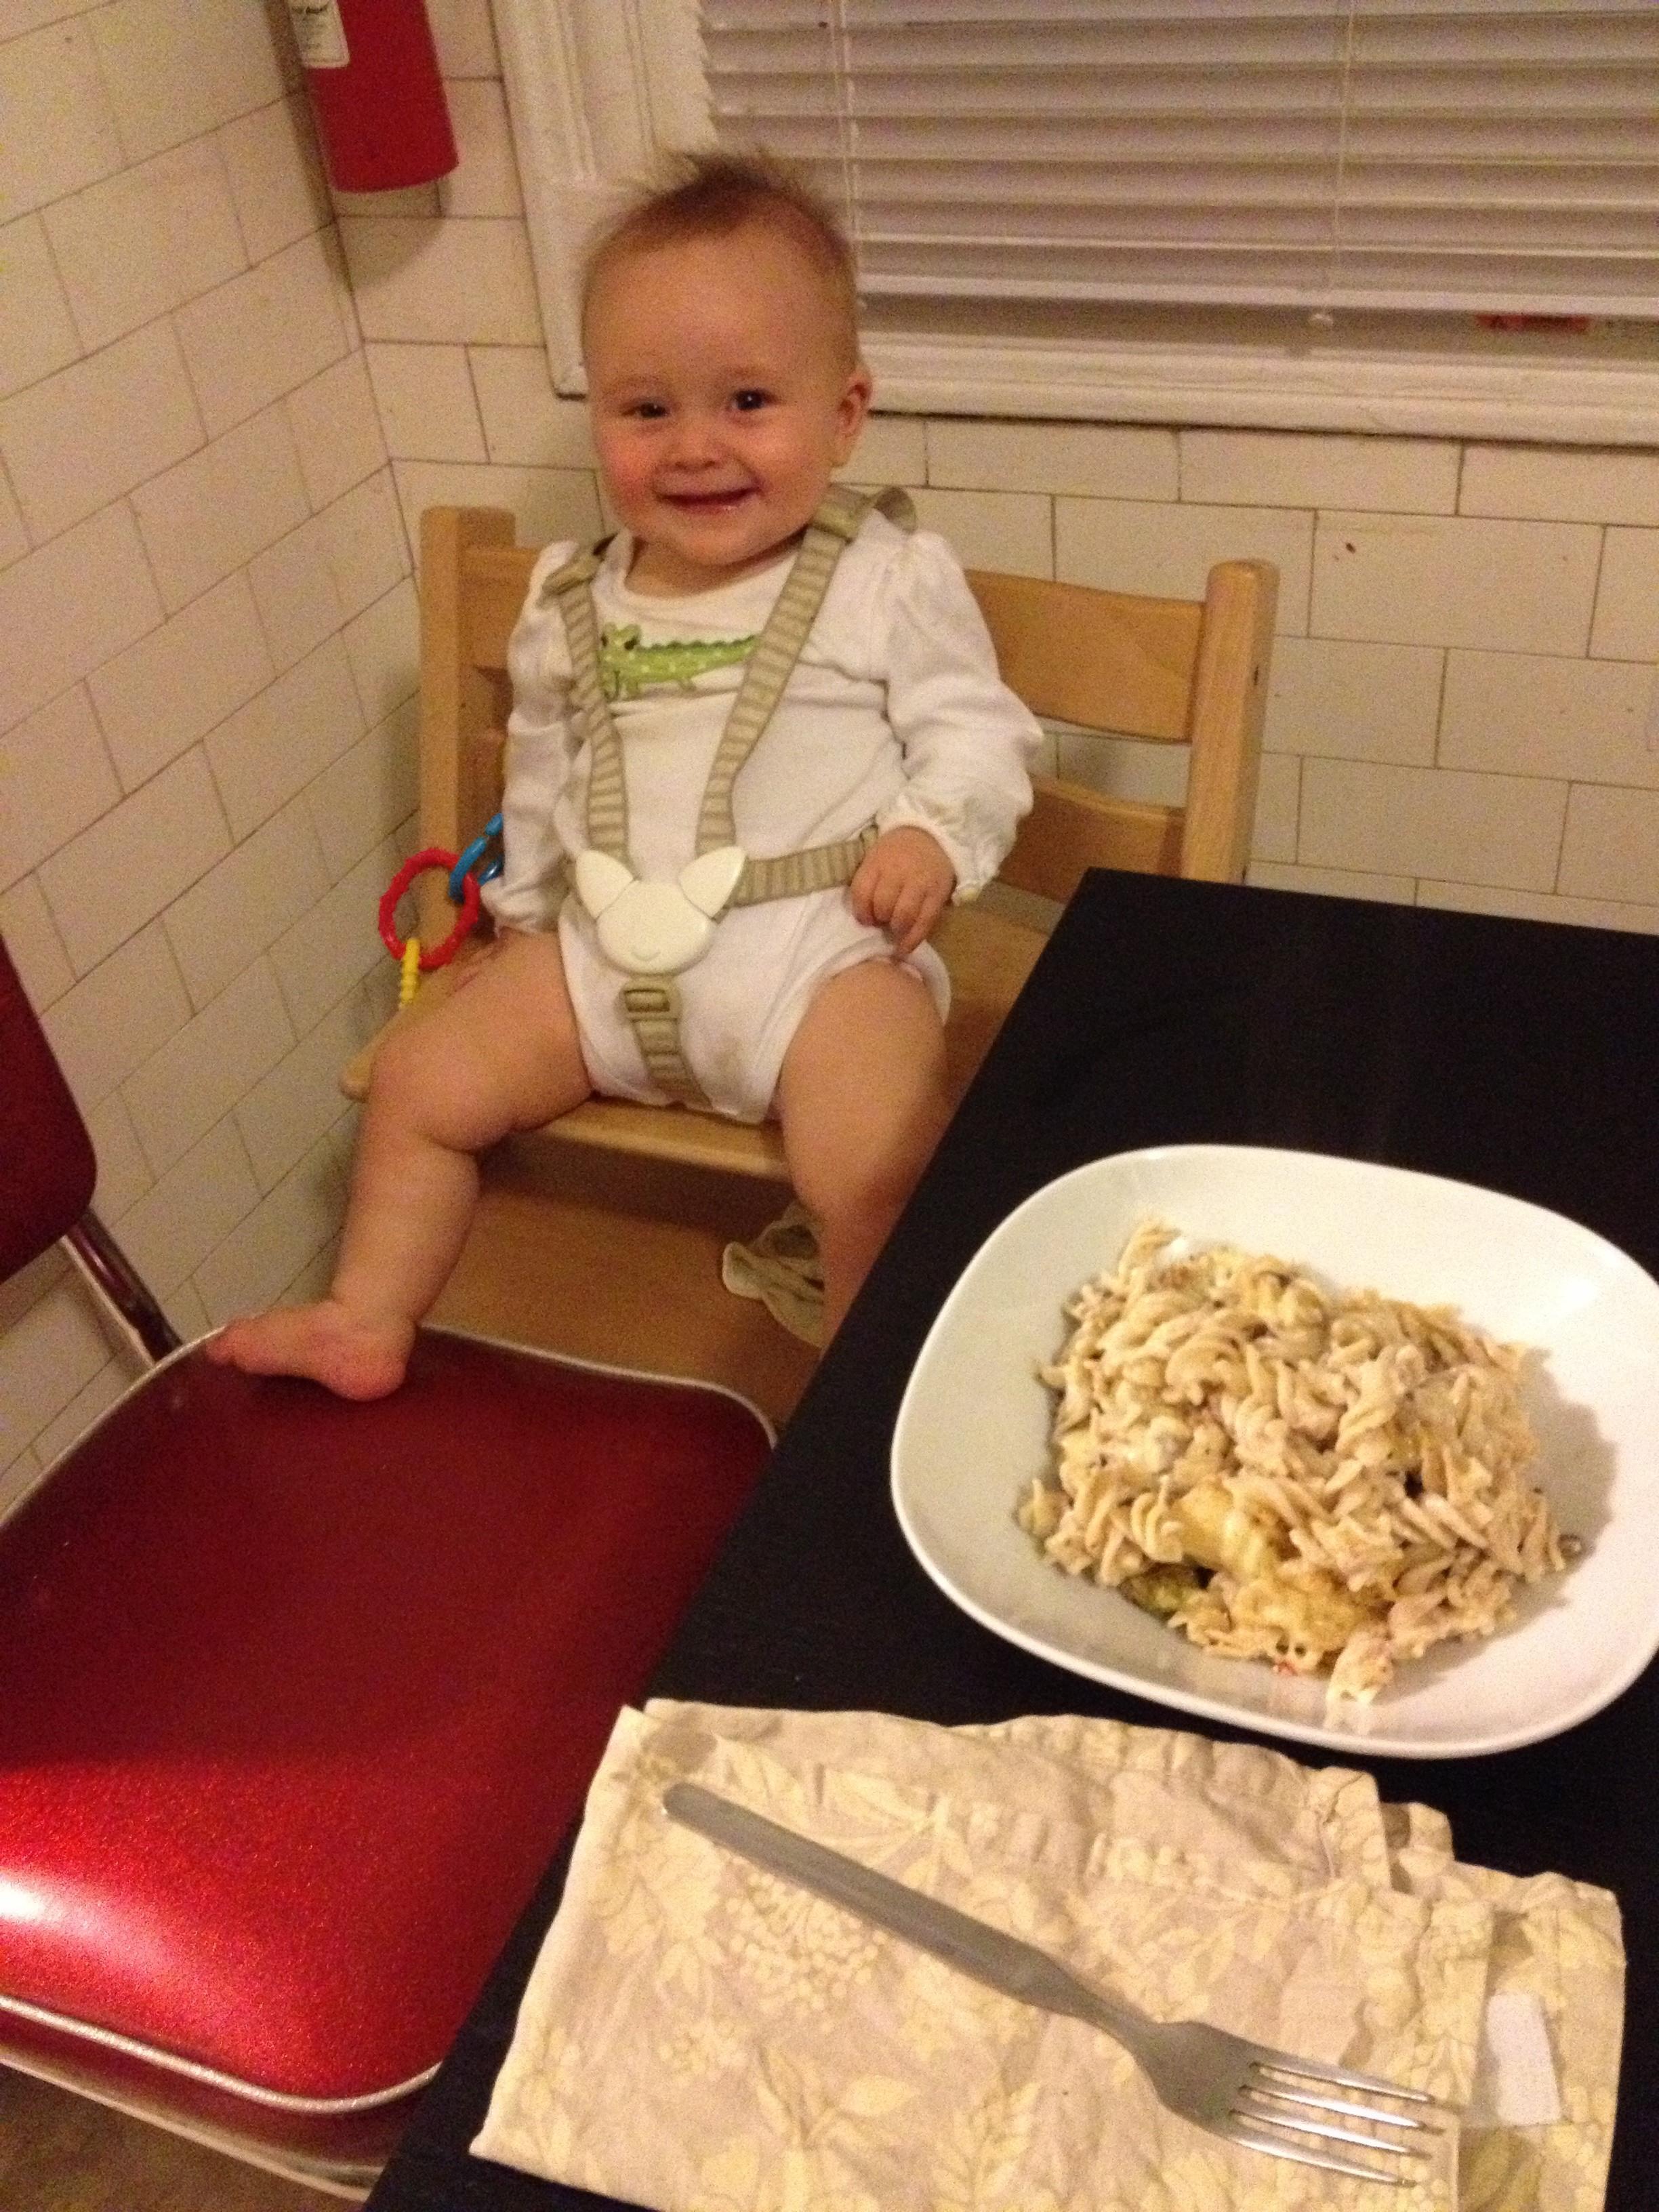 Tuna Casserole with Baby.jpg